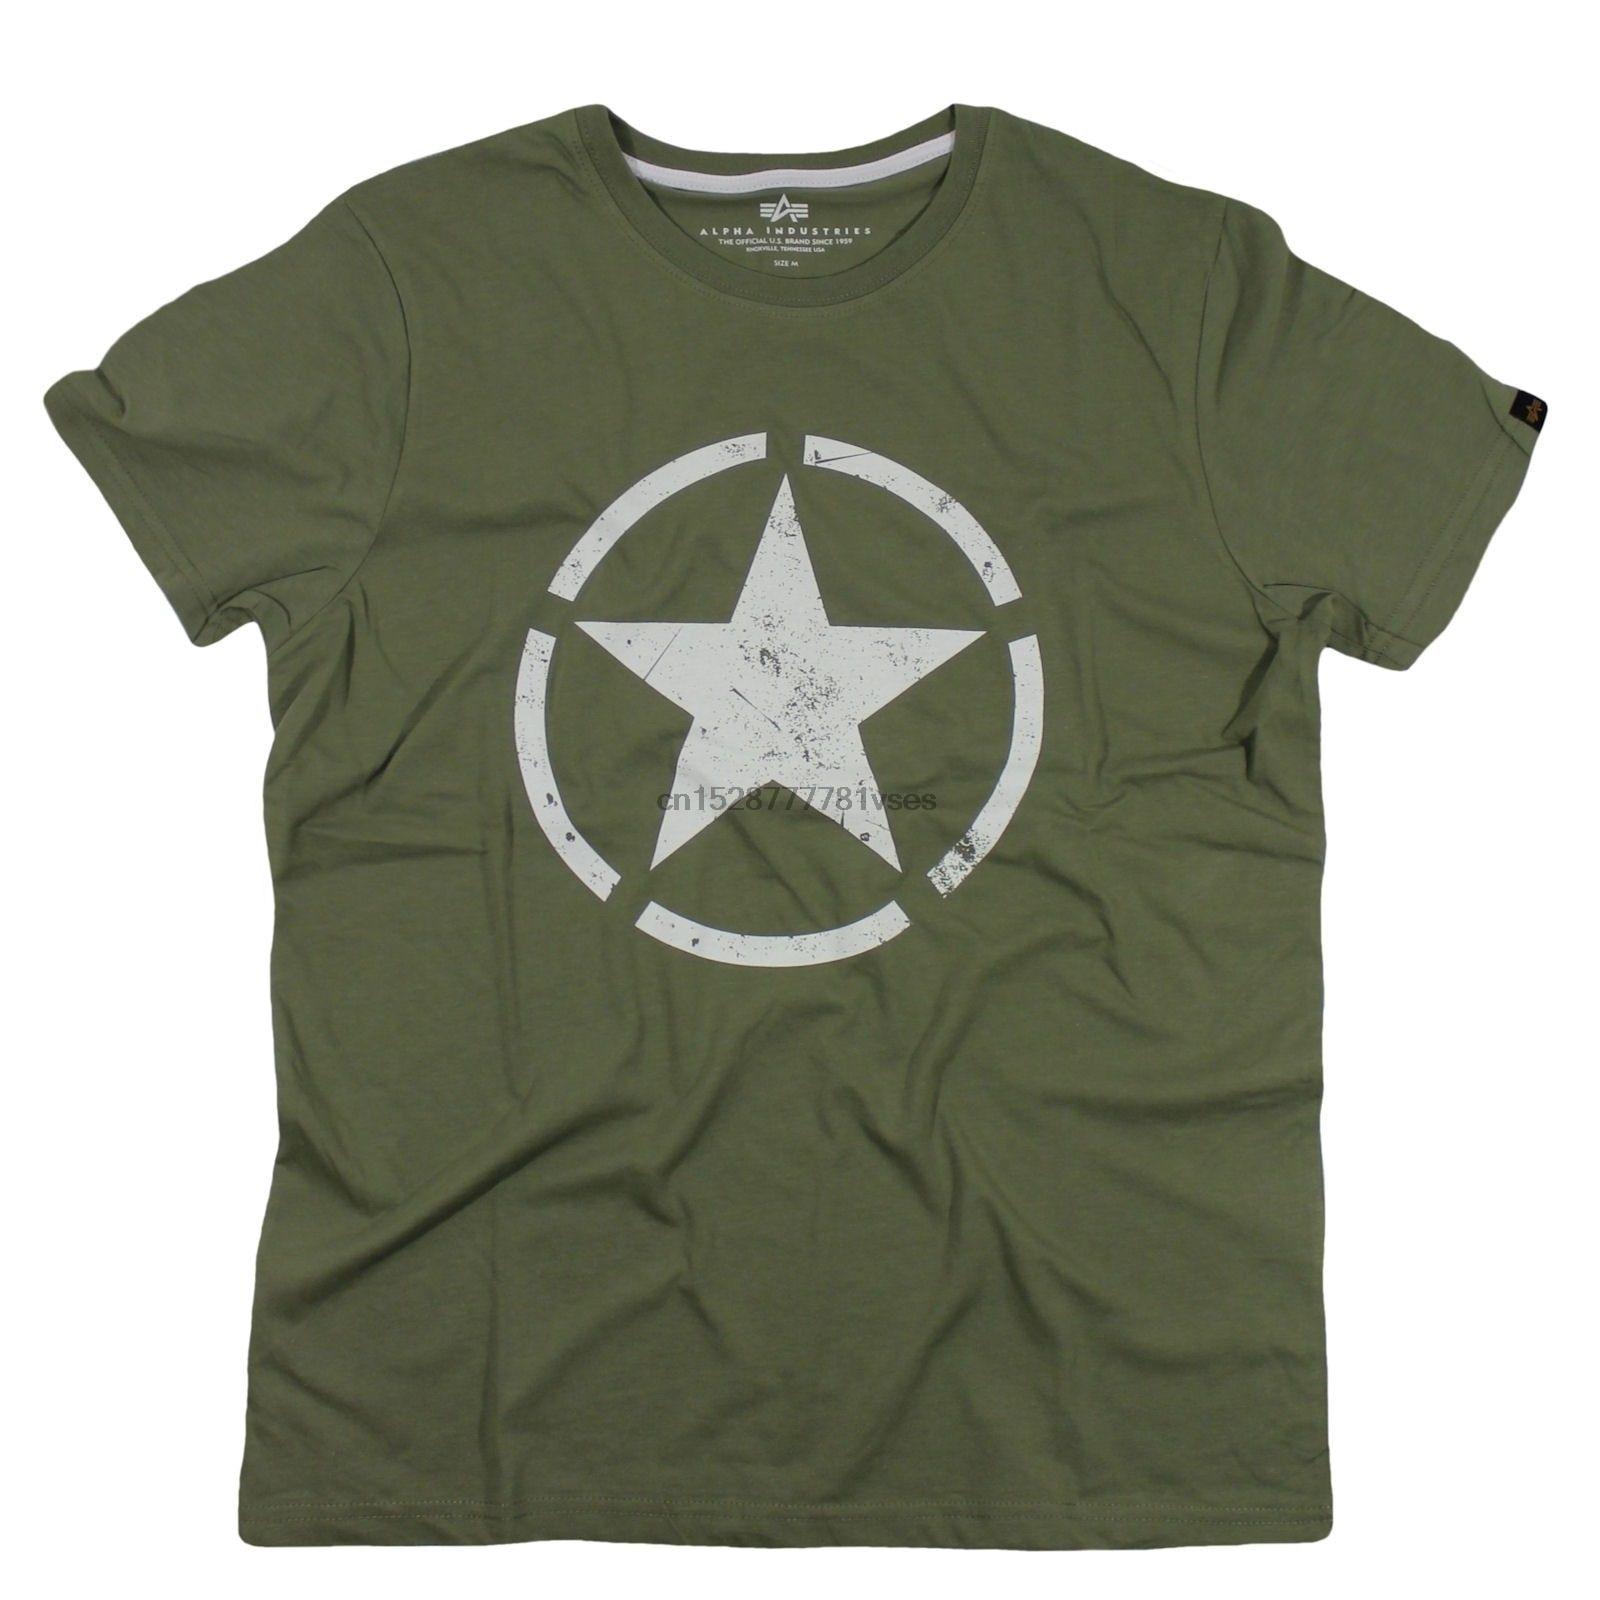 Alpha industries t-shirts estrela t olive moda masculina t camisa frete grátis camiseta superior 2019 manga curta o pescoço